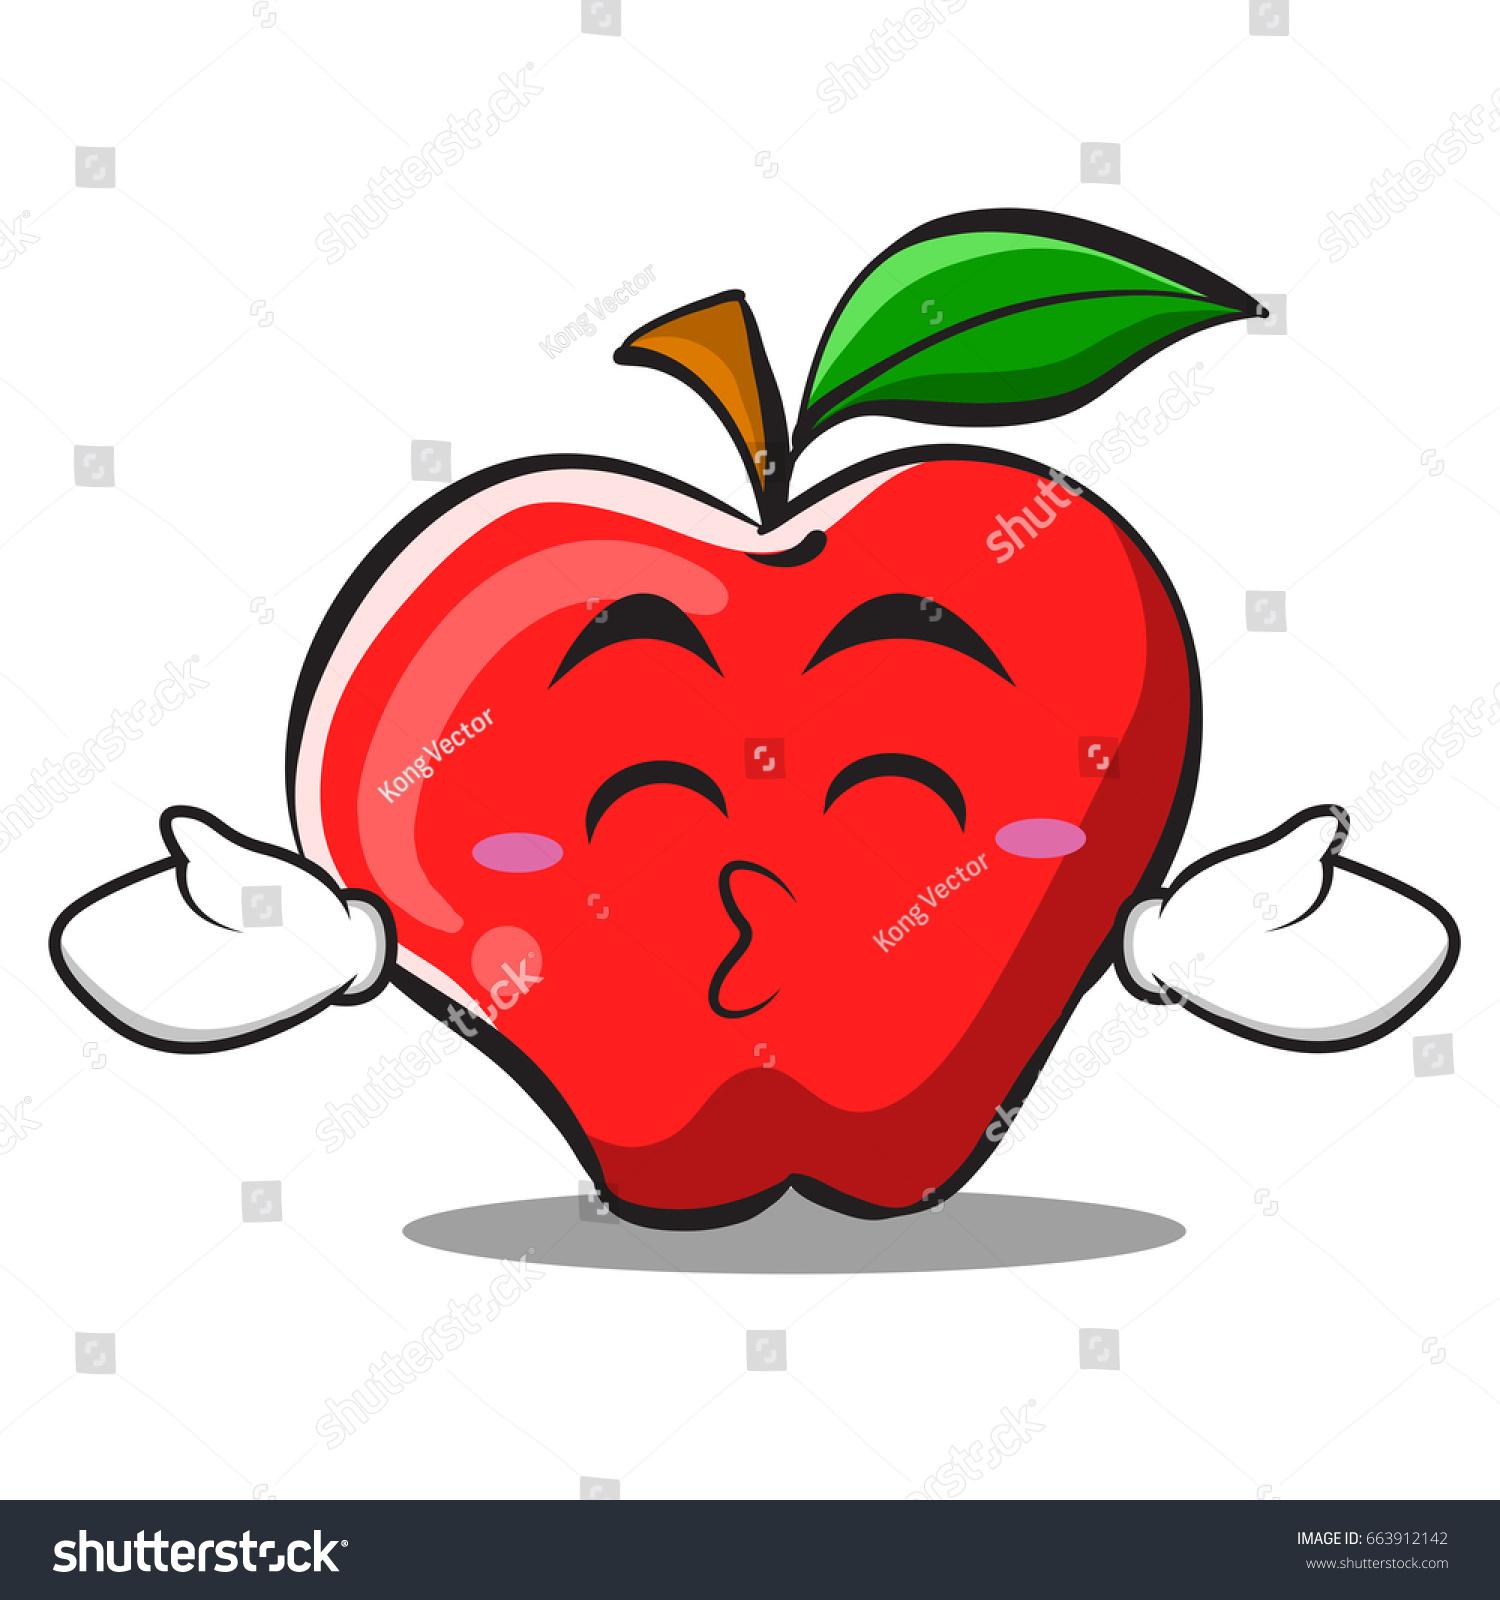 Apple Character Design : Kissing closed eyes apple cartoon character stock vector